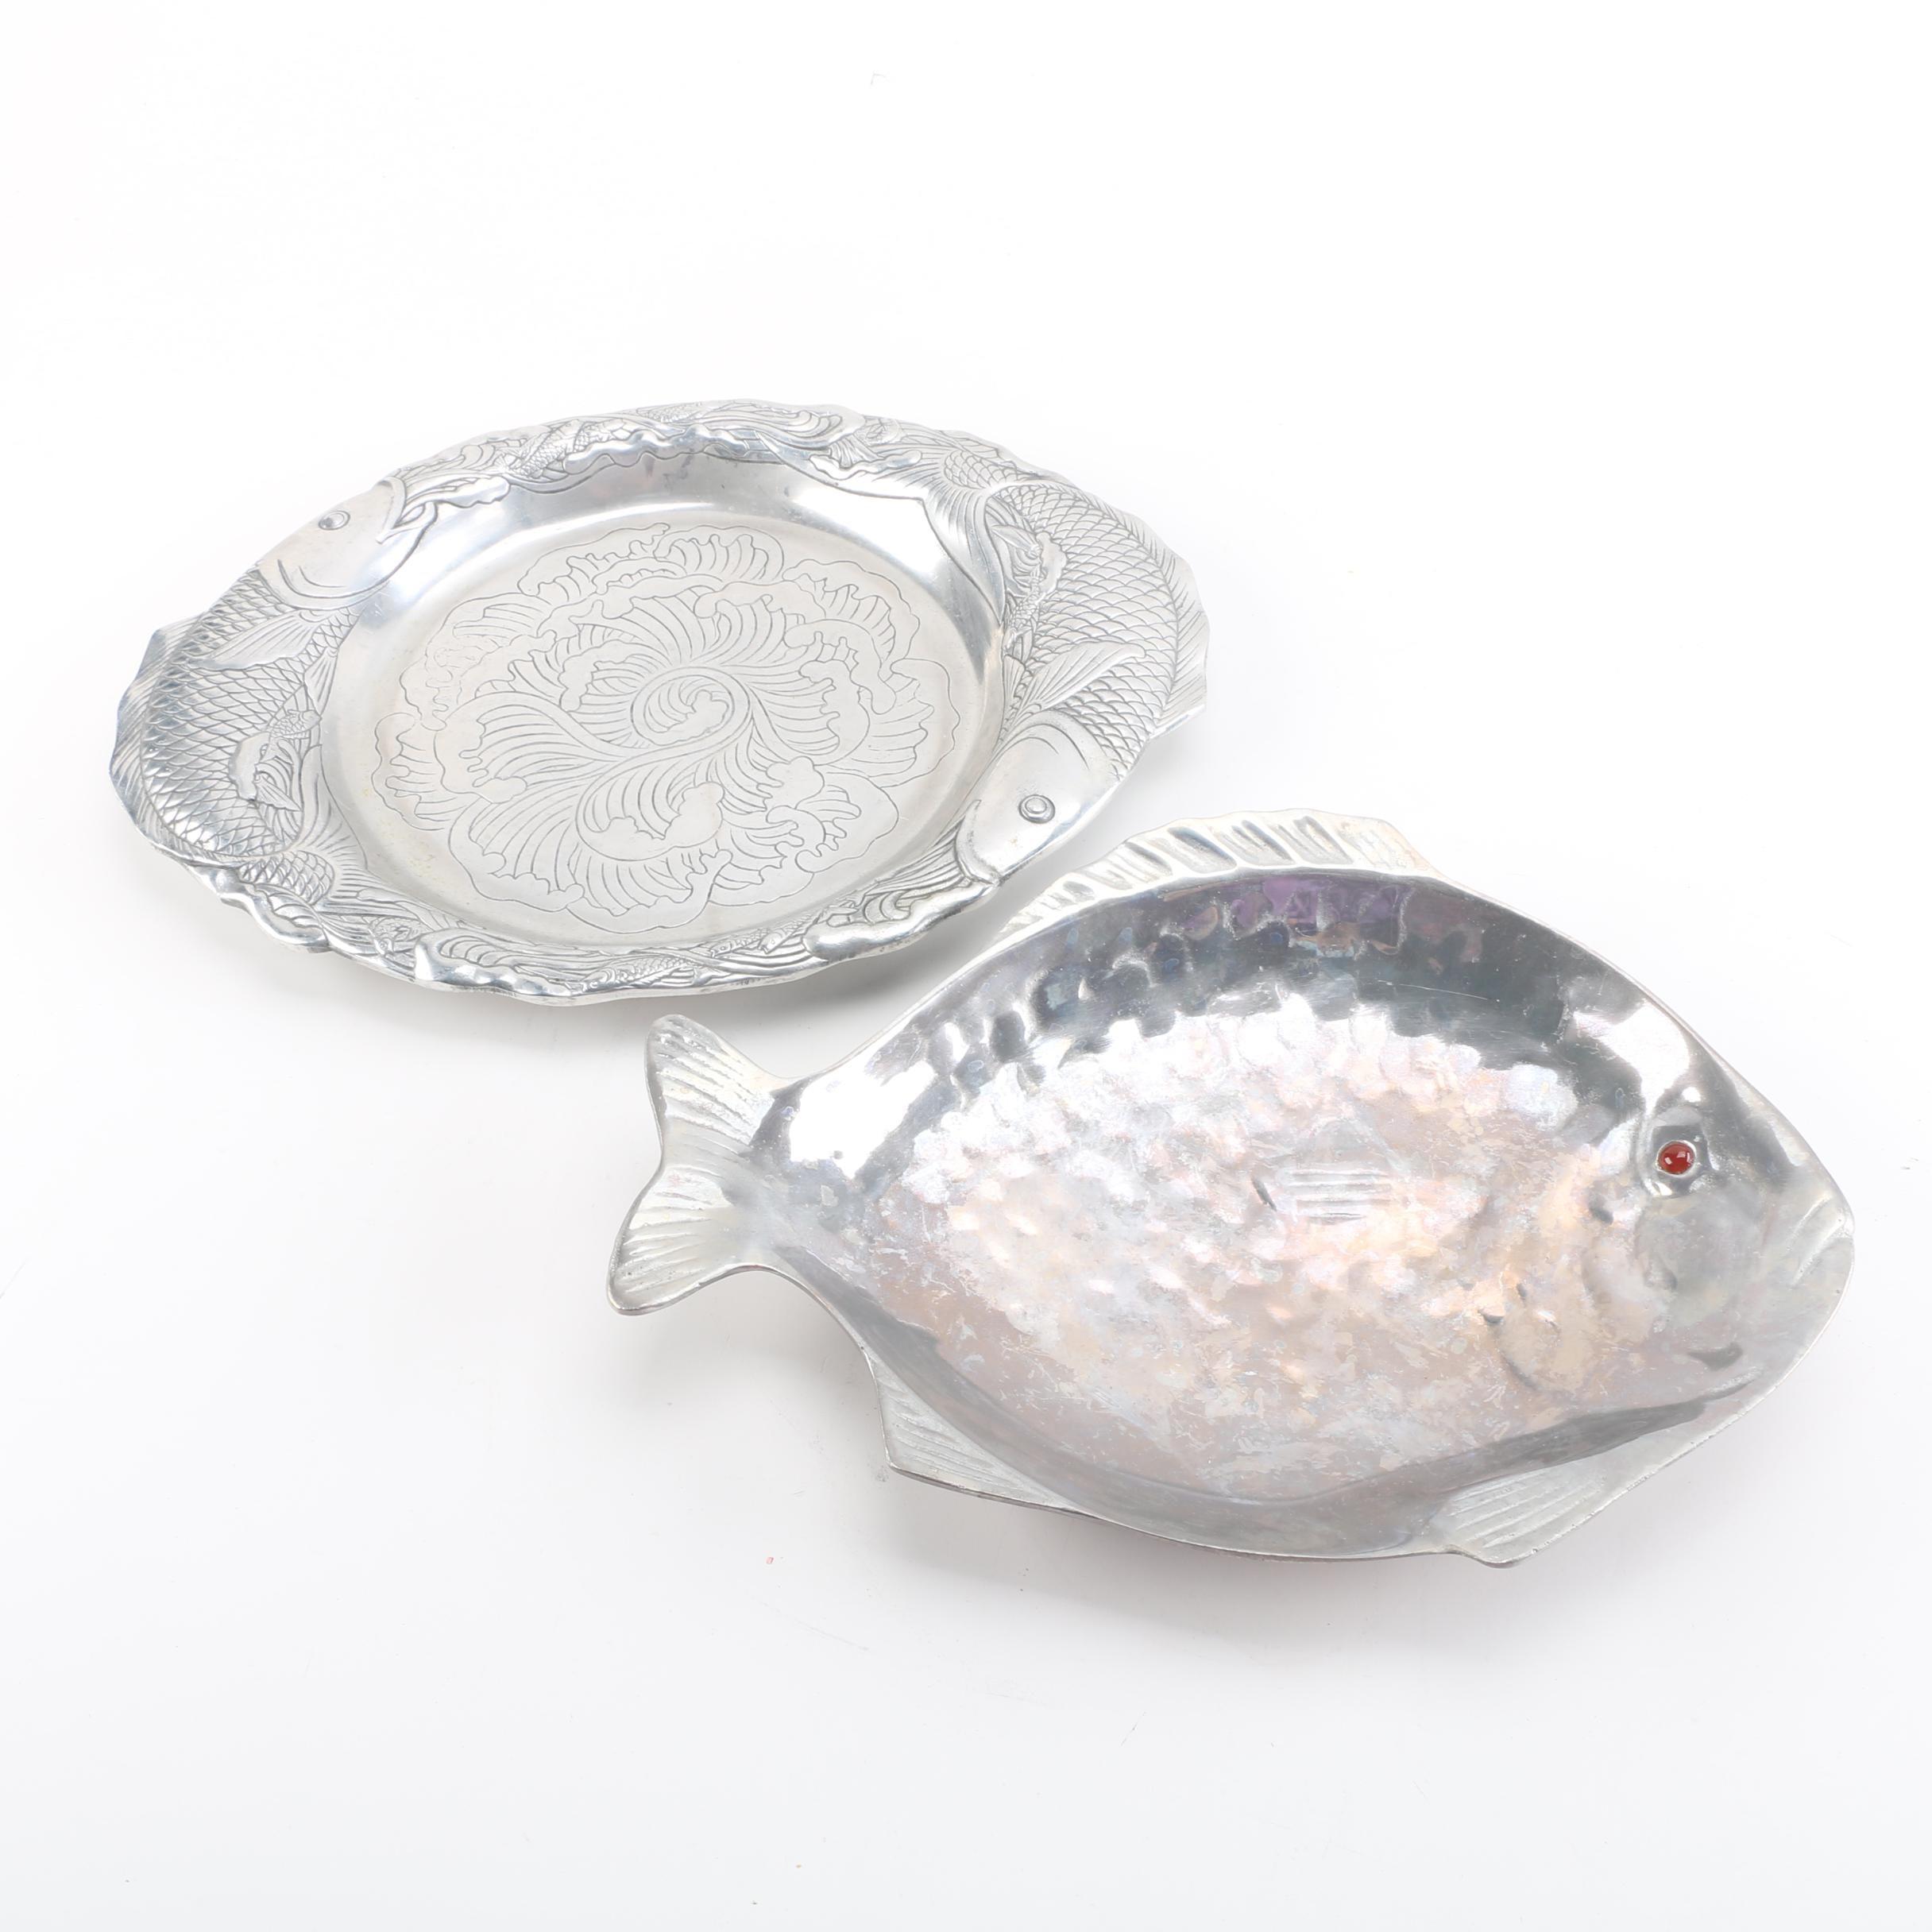 Arthur Court Fish Themed Aluminum Serving Platter and Bowl